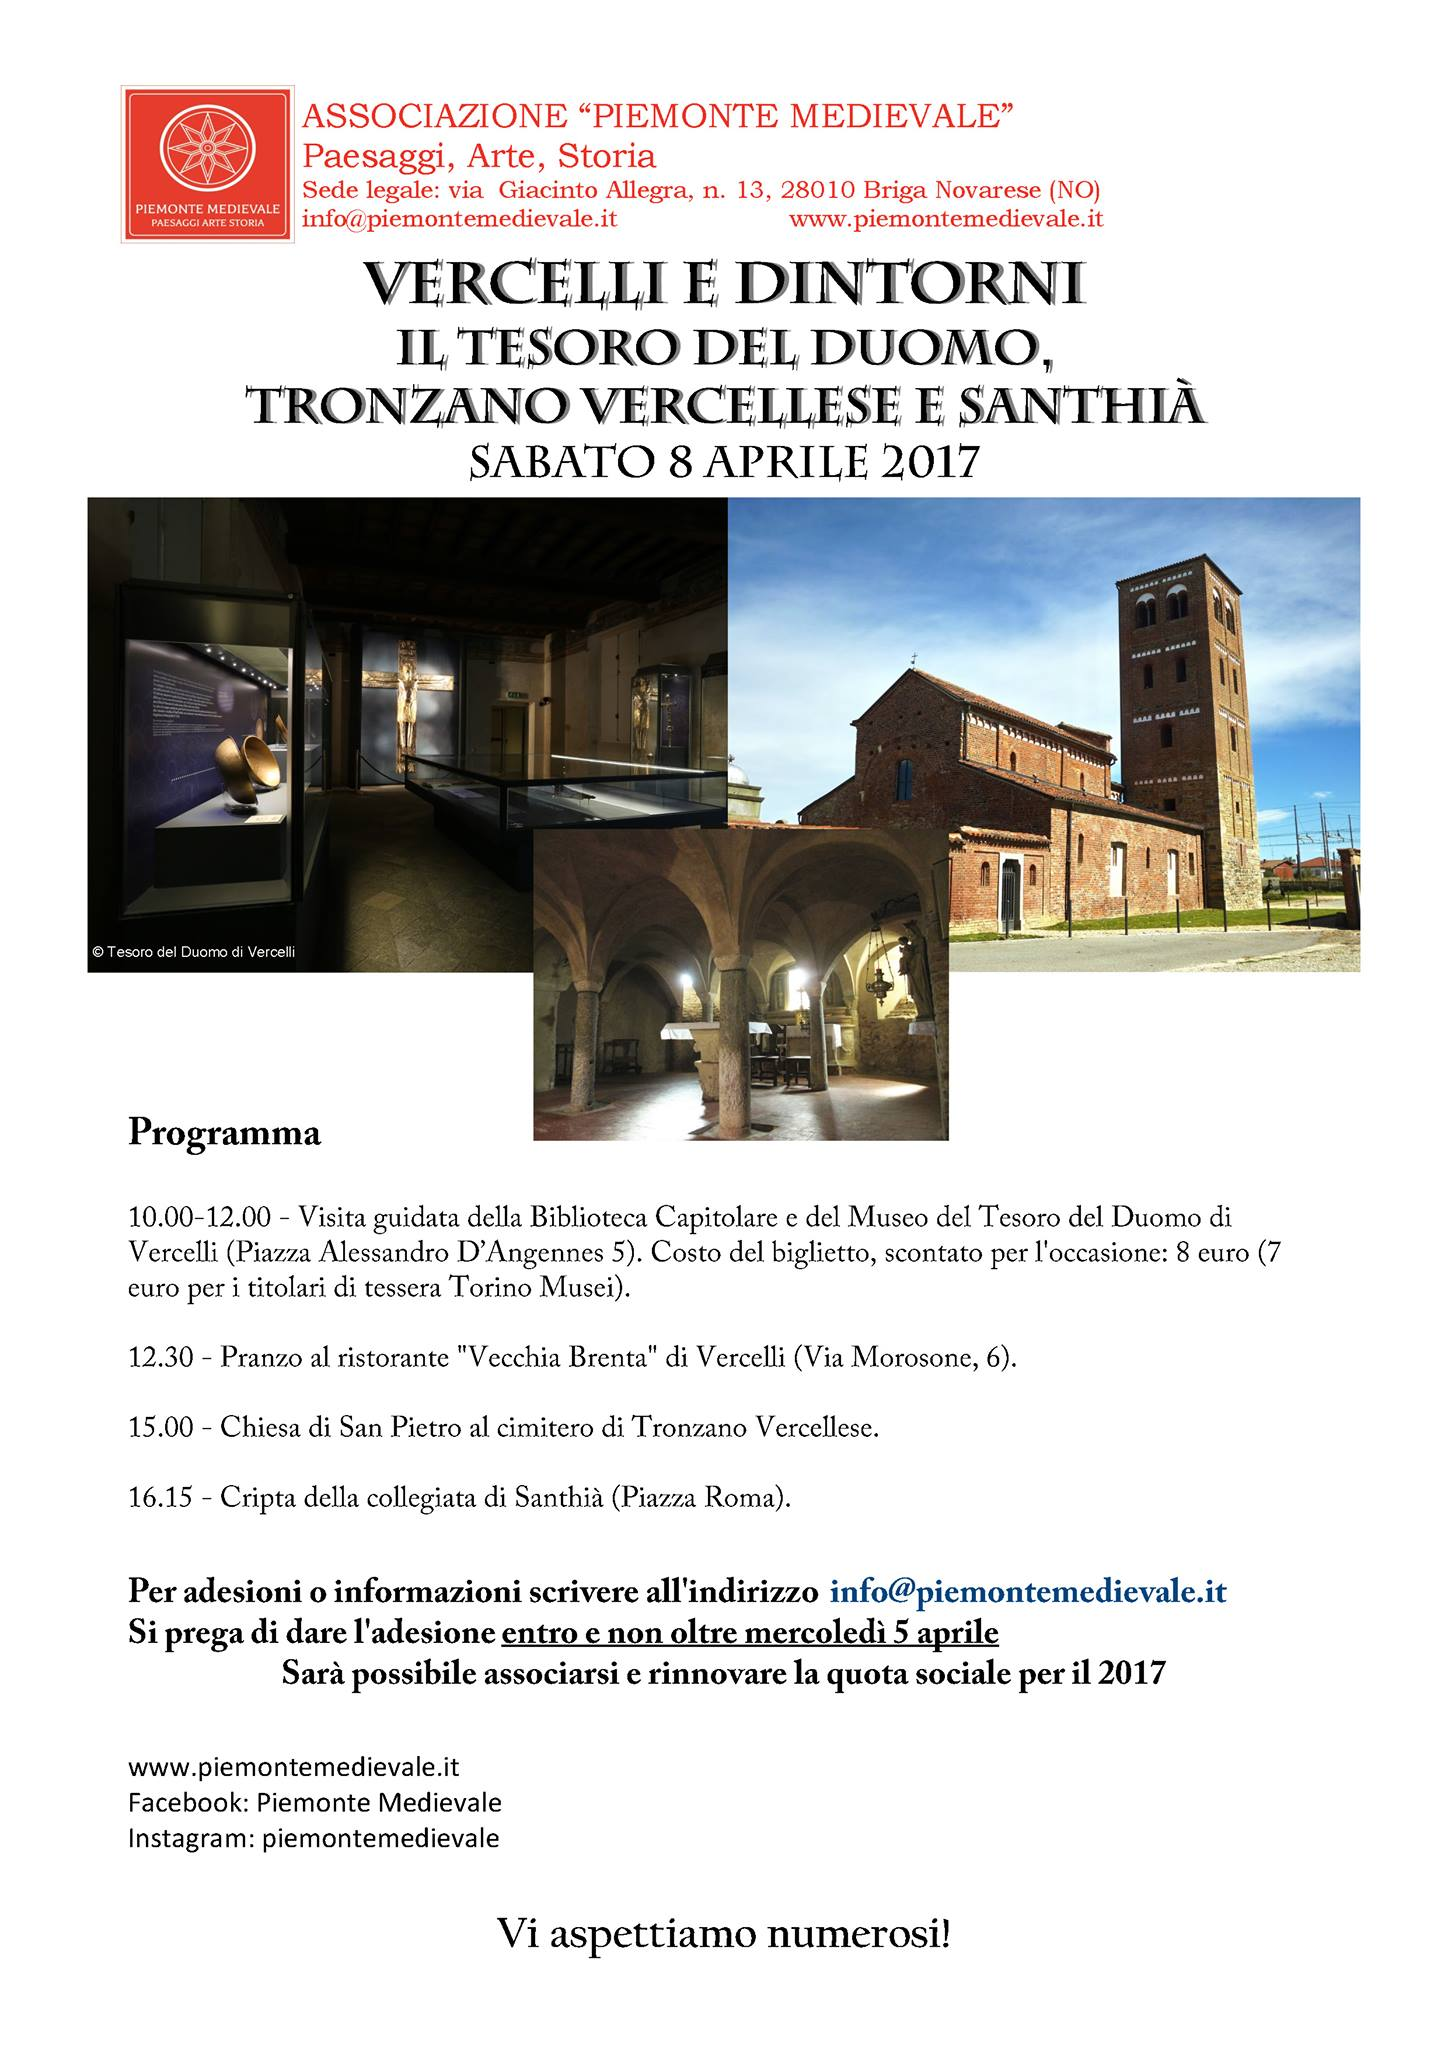 Piemonte Medievale Versej 8 4 2017